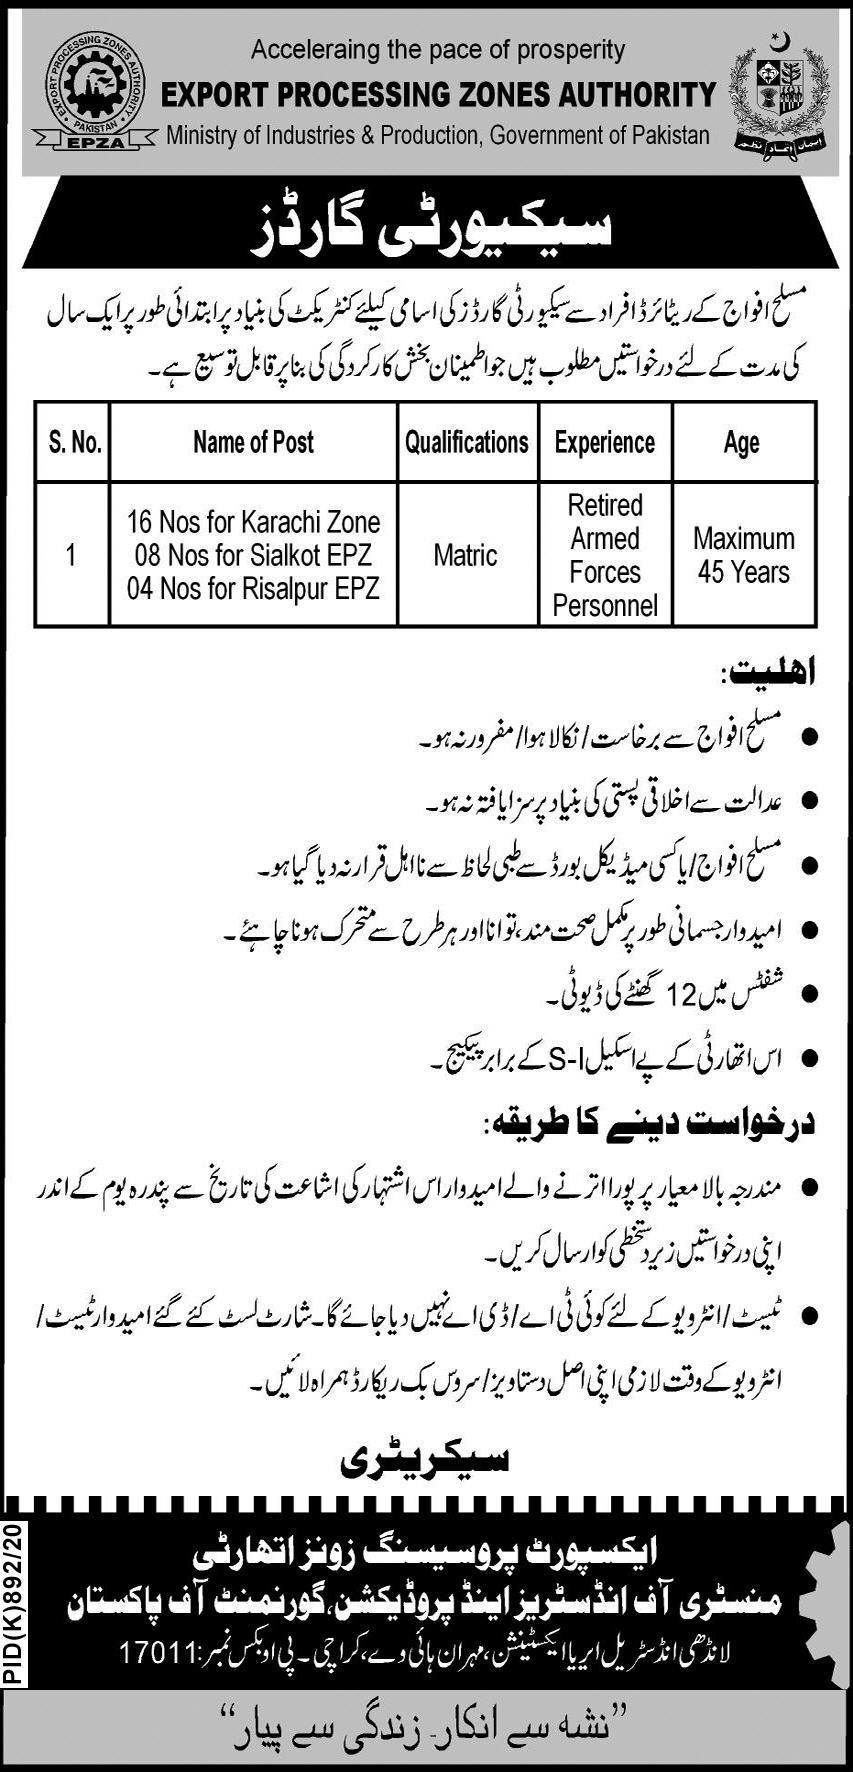 Export Processing Zones Authority EPZA Latest Jobs Advertisement in Pakistan